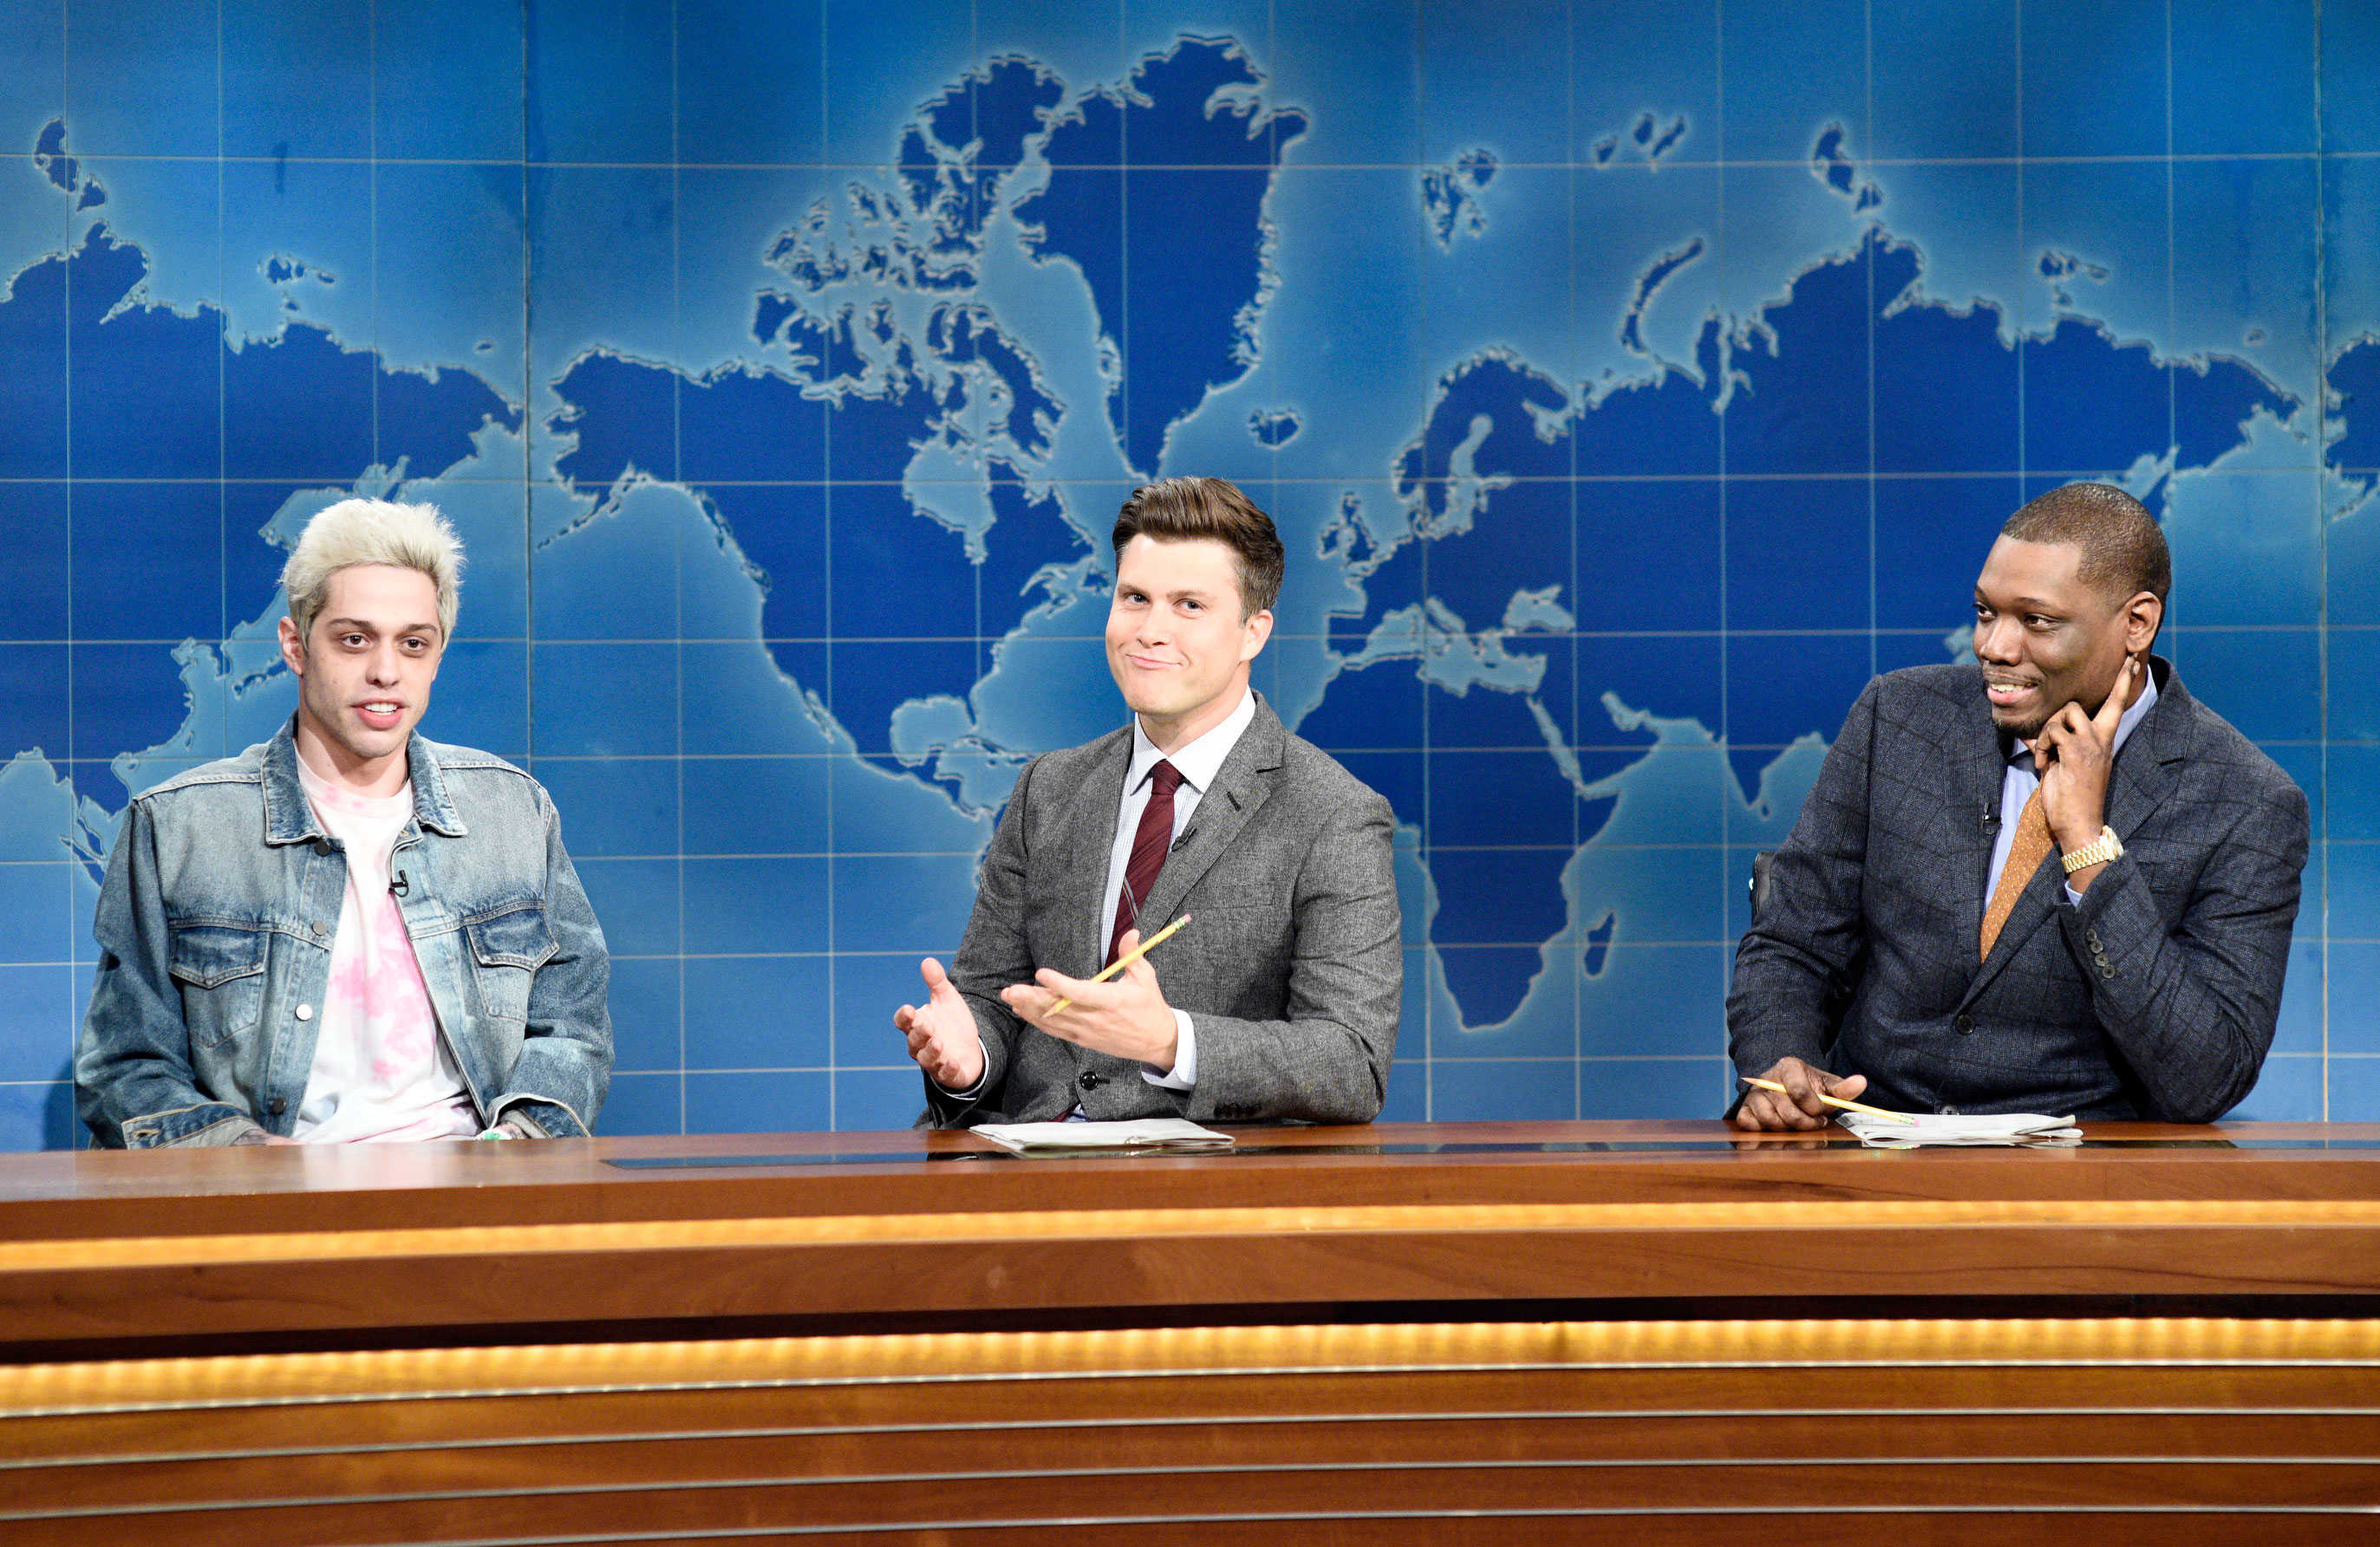 'Saturday Night Live': Pete Davidson Pokes Fun at His 'Open Book' Personal Life